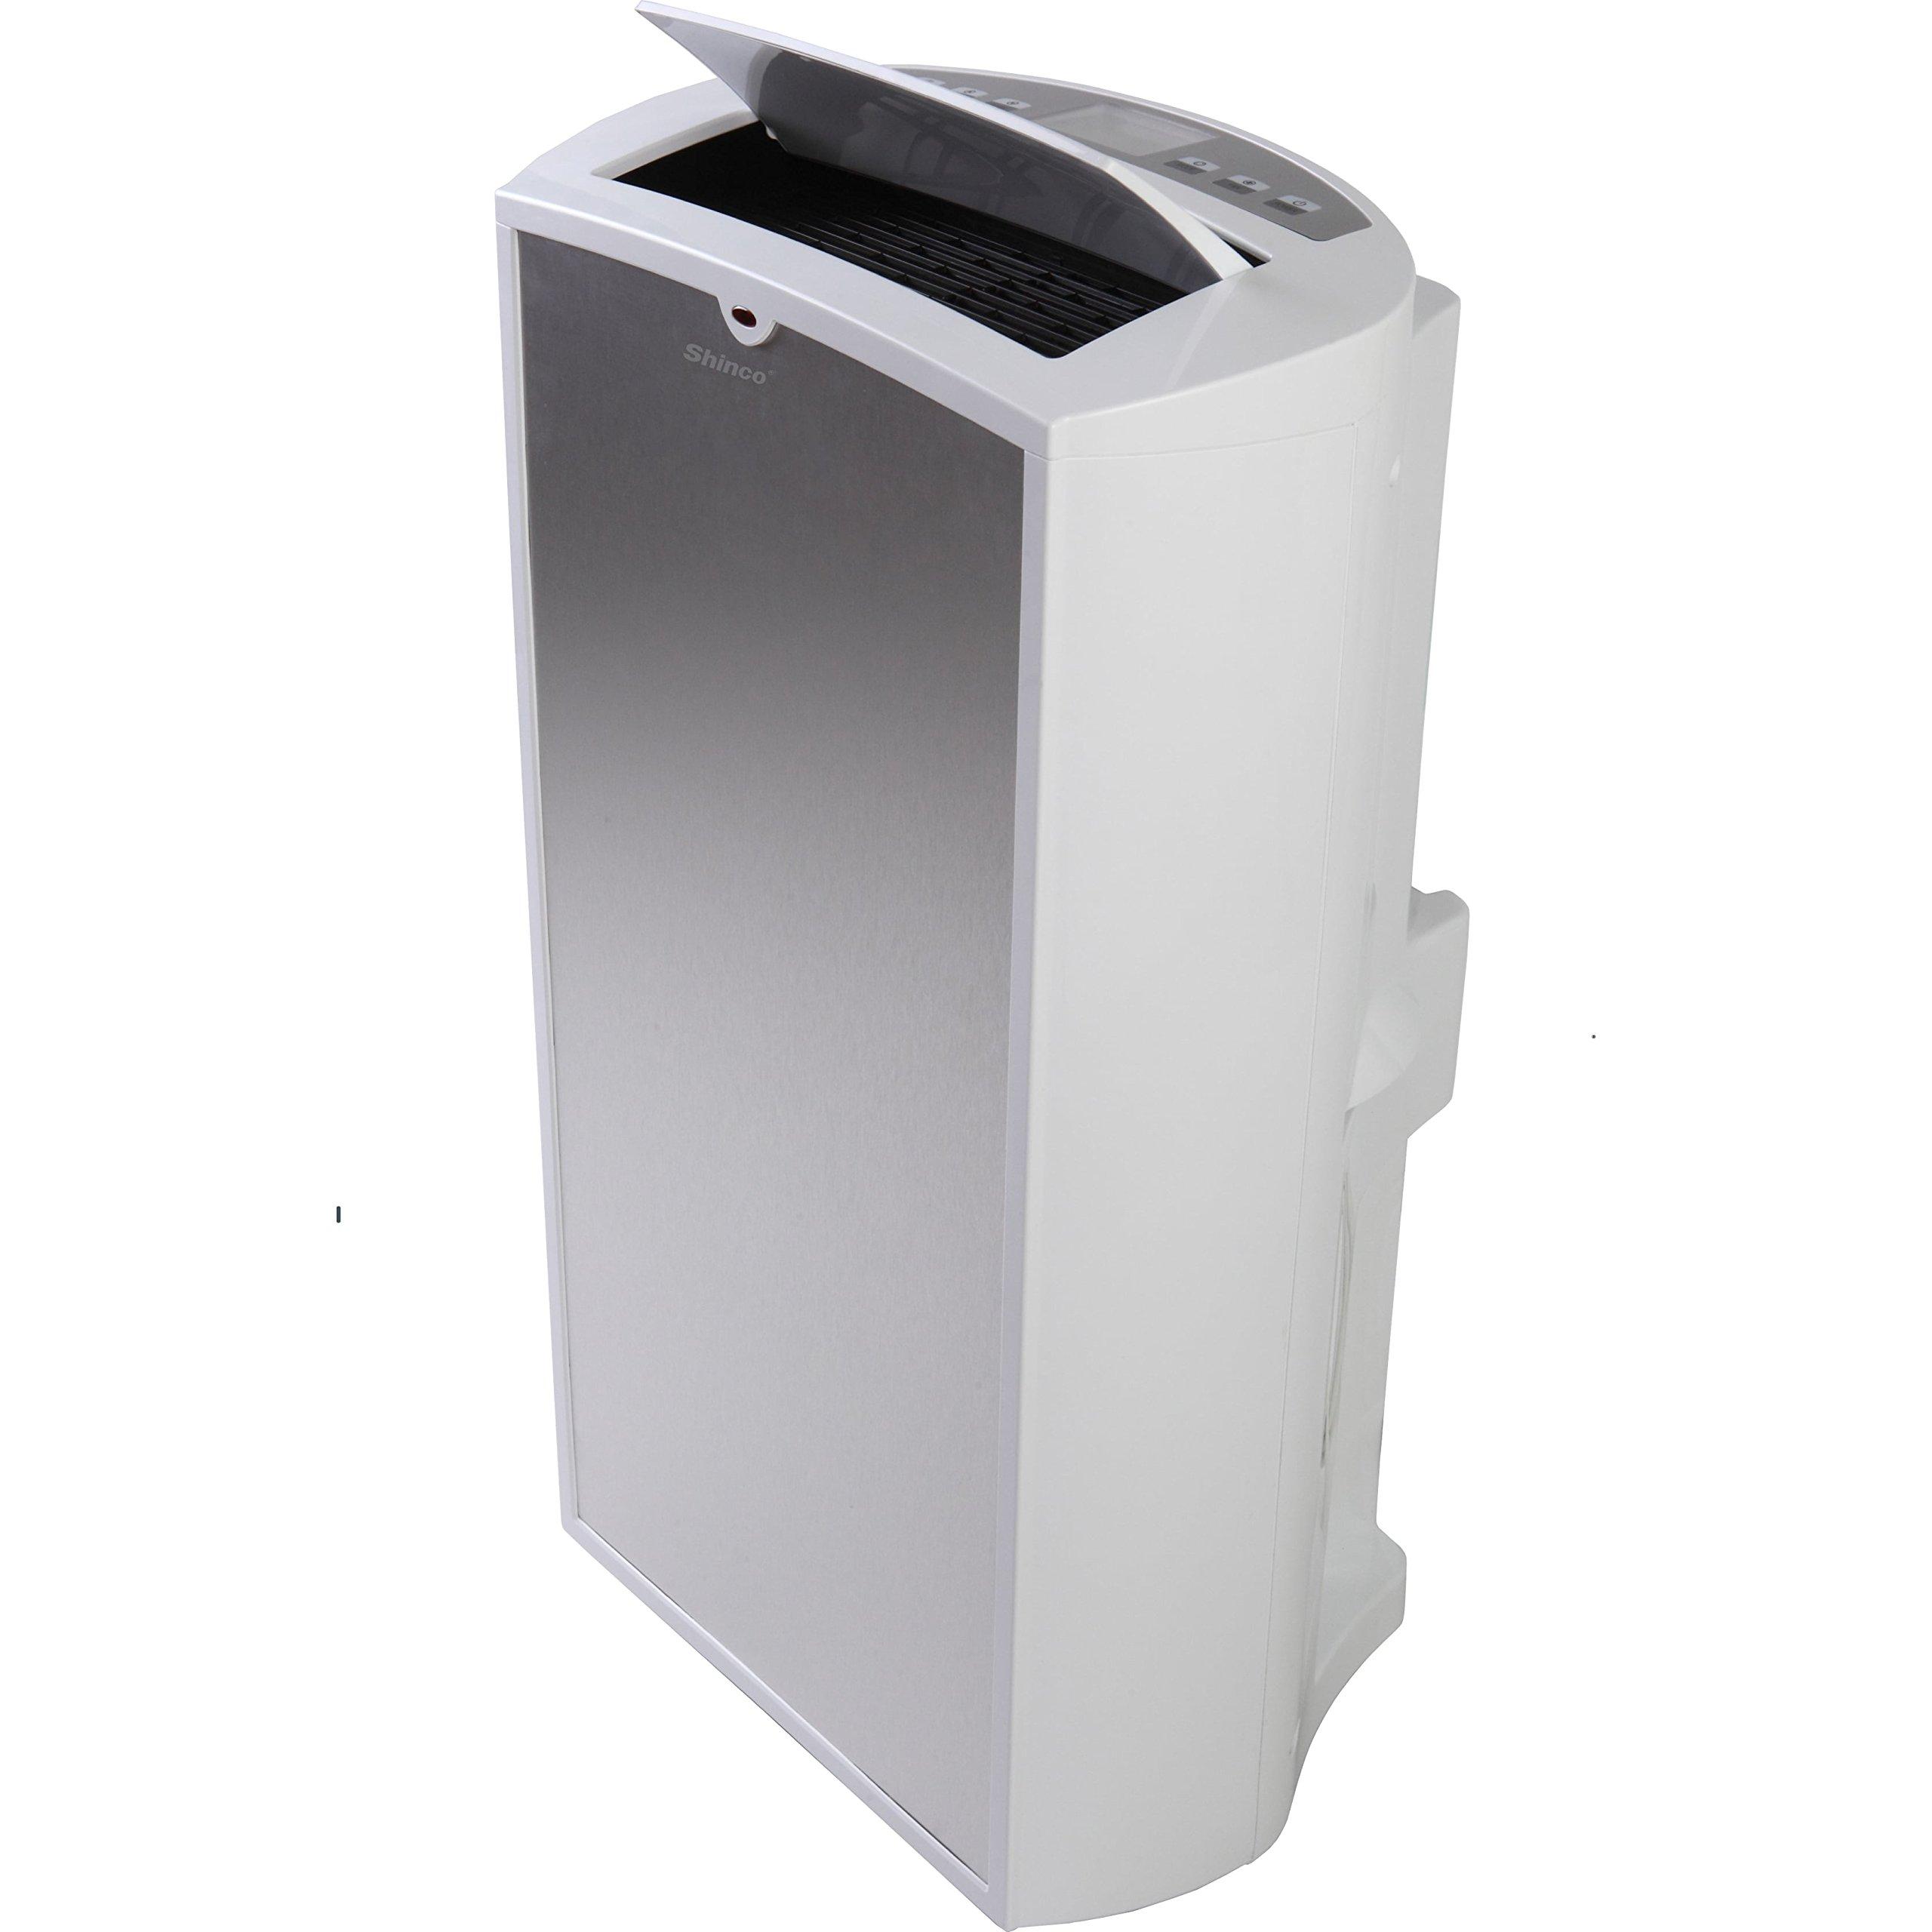 Shinco USA SPHN12W-12000 BTU Portable Air Conditioner with Heat Option by Shinco